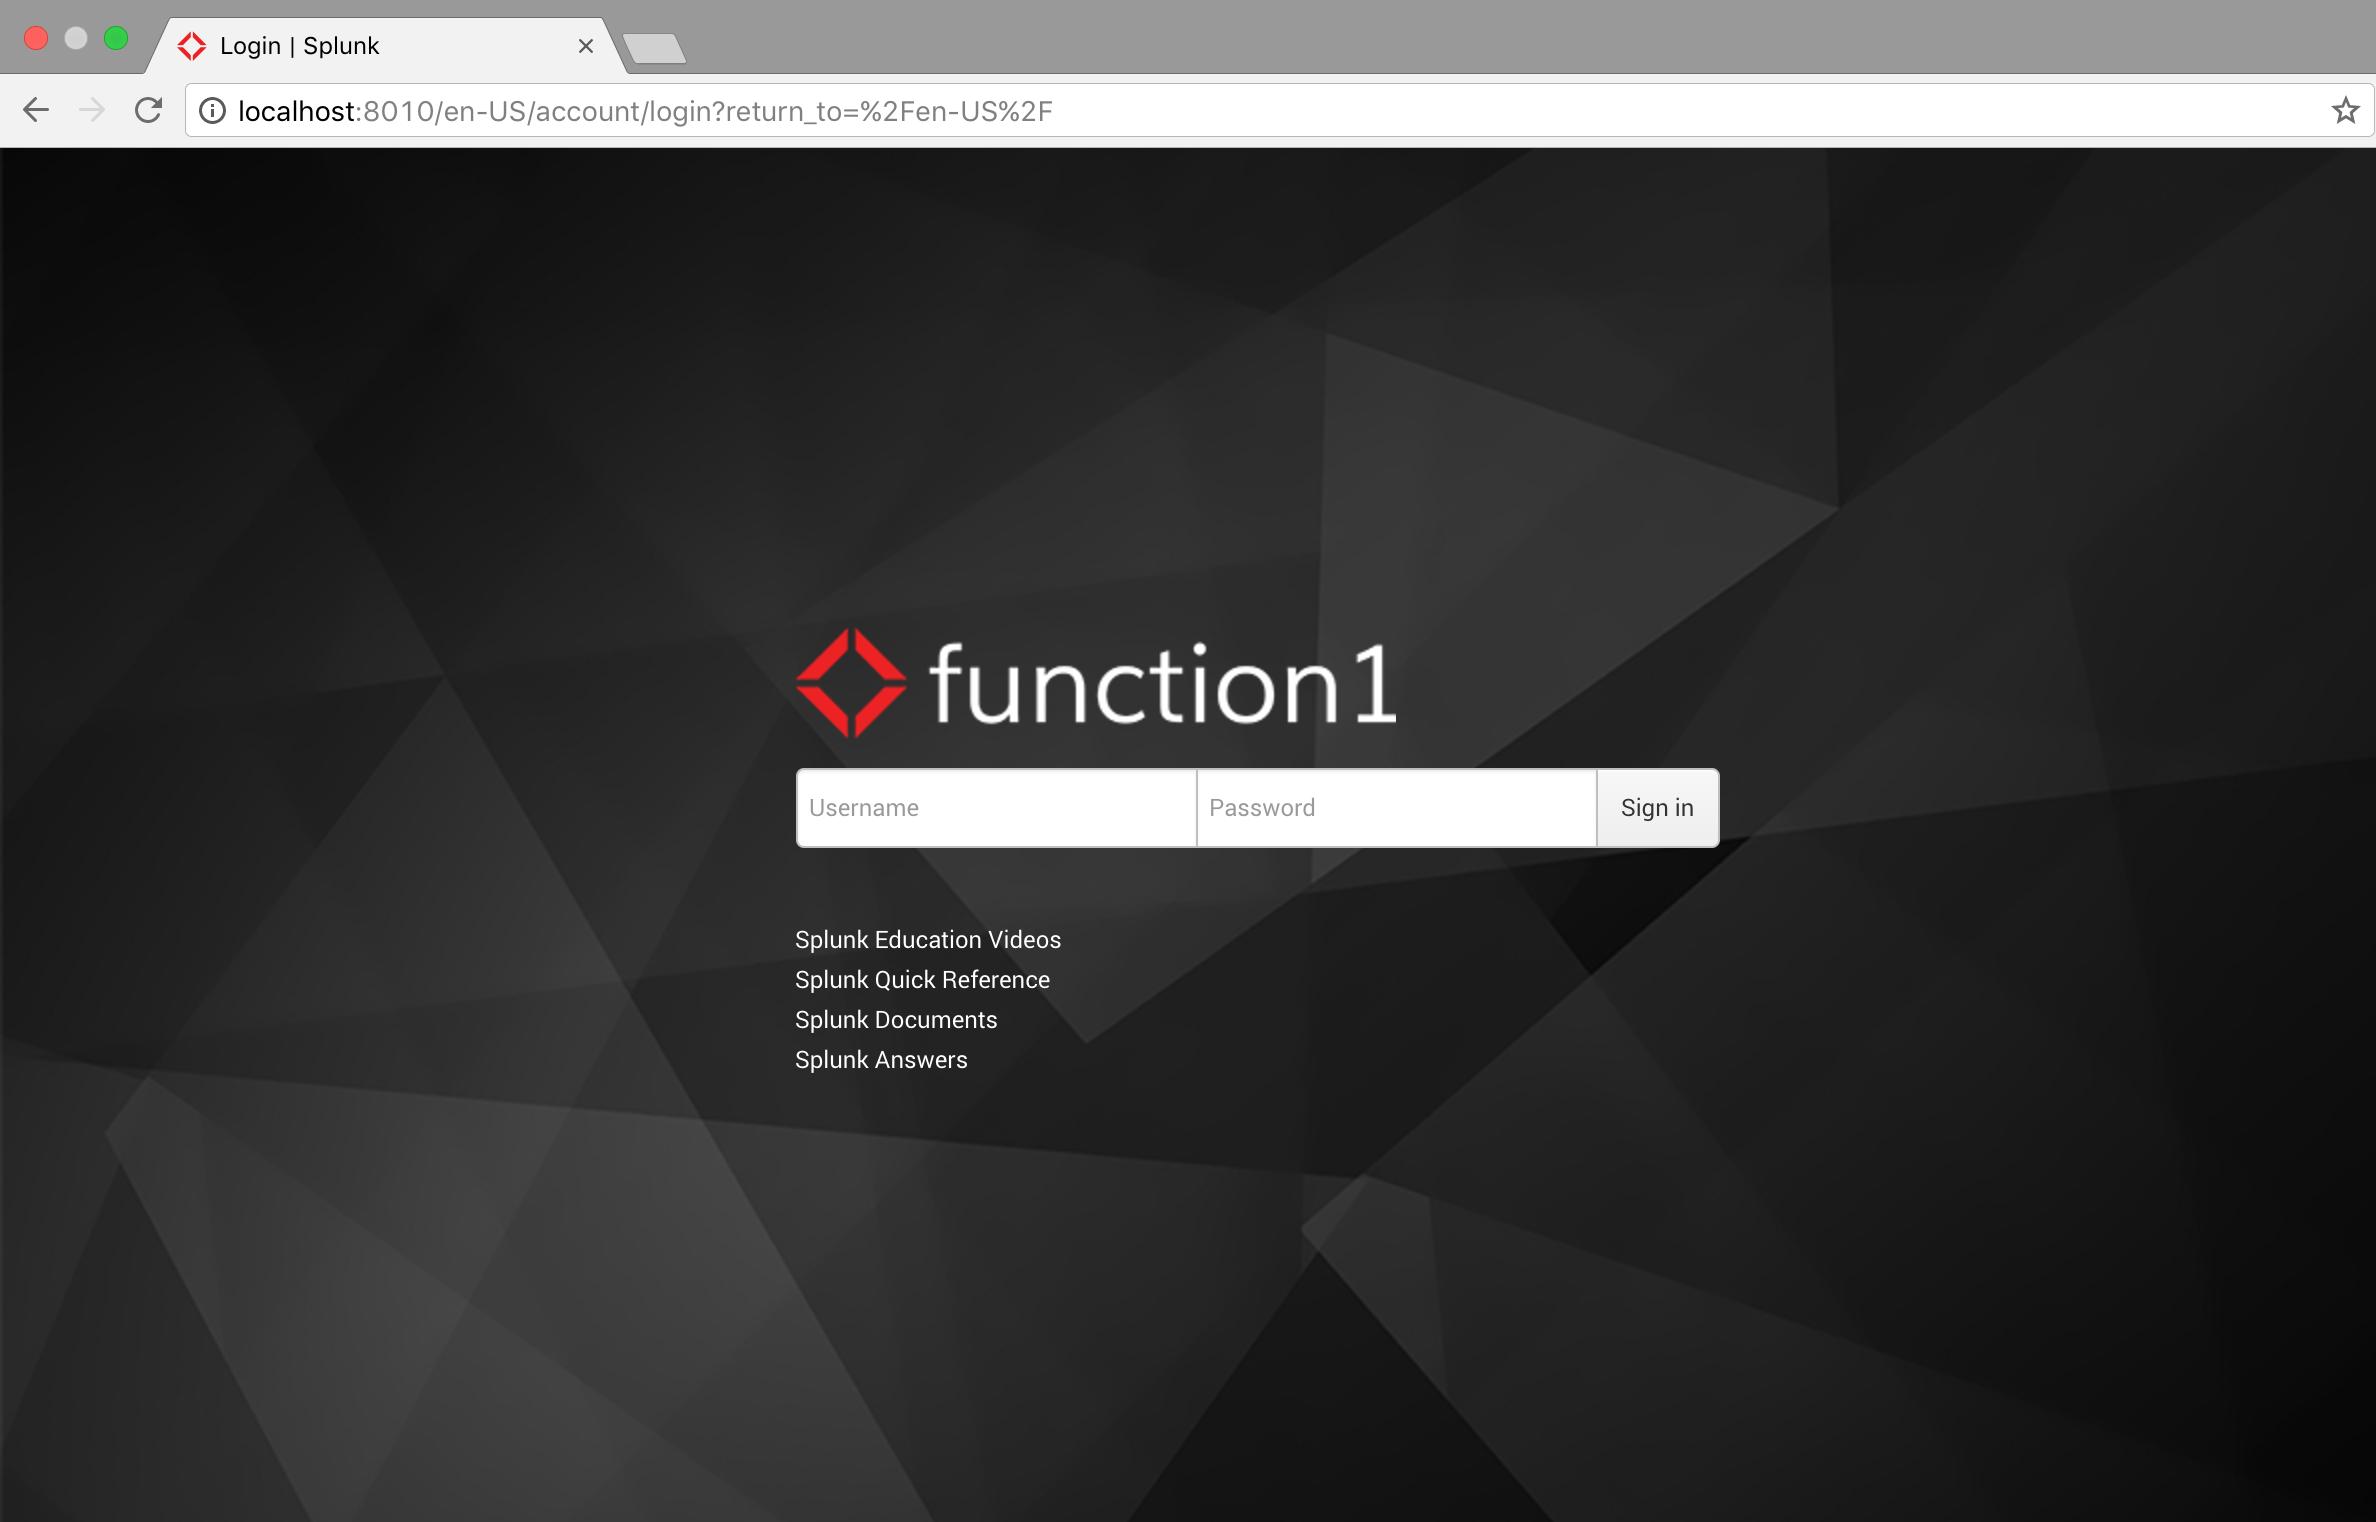 Customizing the Splunk Login Page | Function1